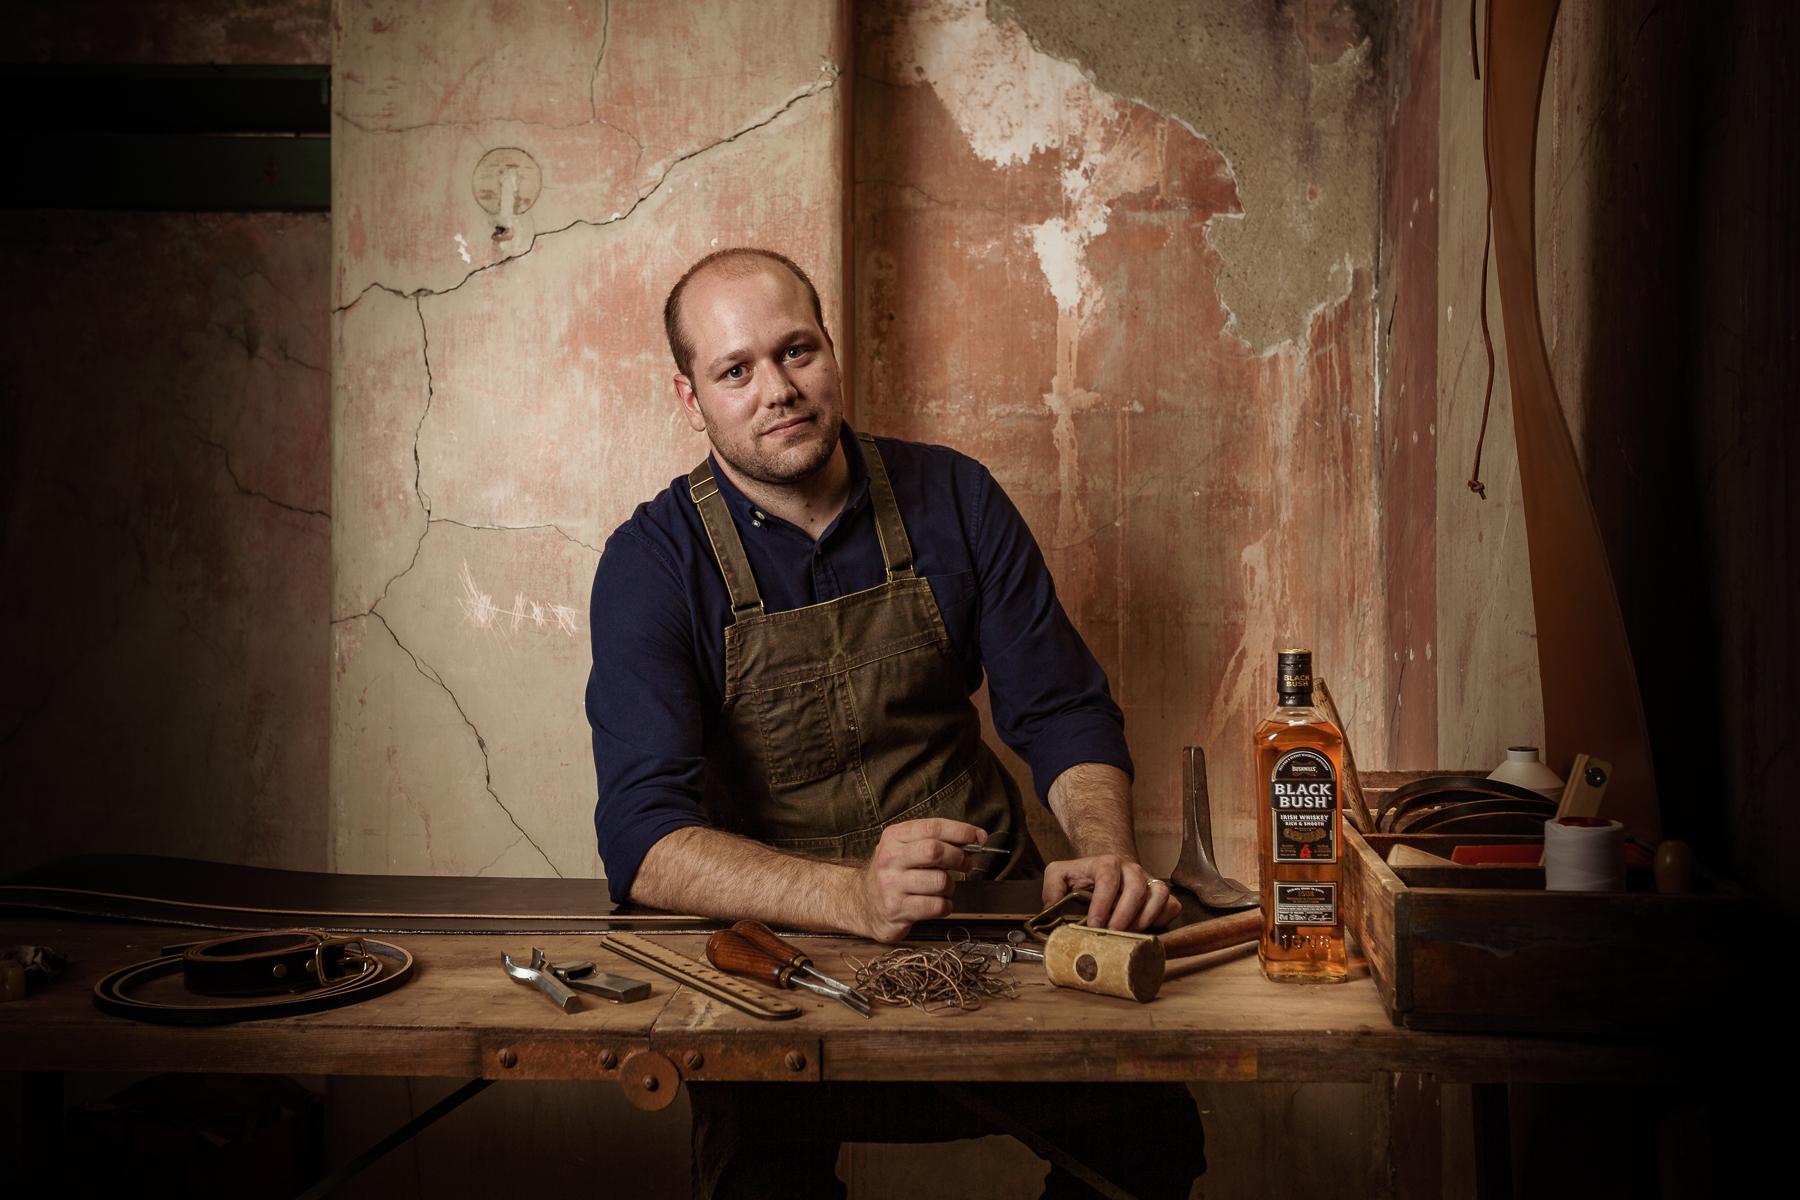 Bushmillsirish Whiskey Collaborates With Master Craftsman To Host Workshop photo